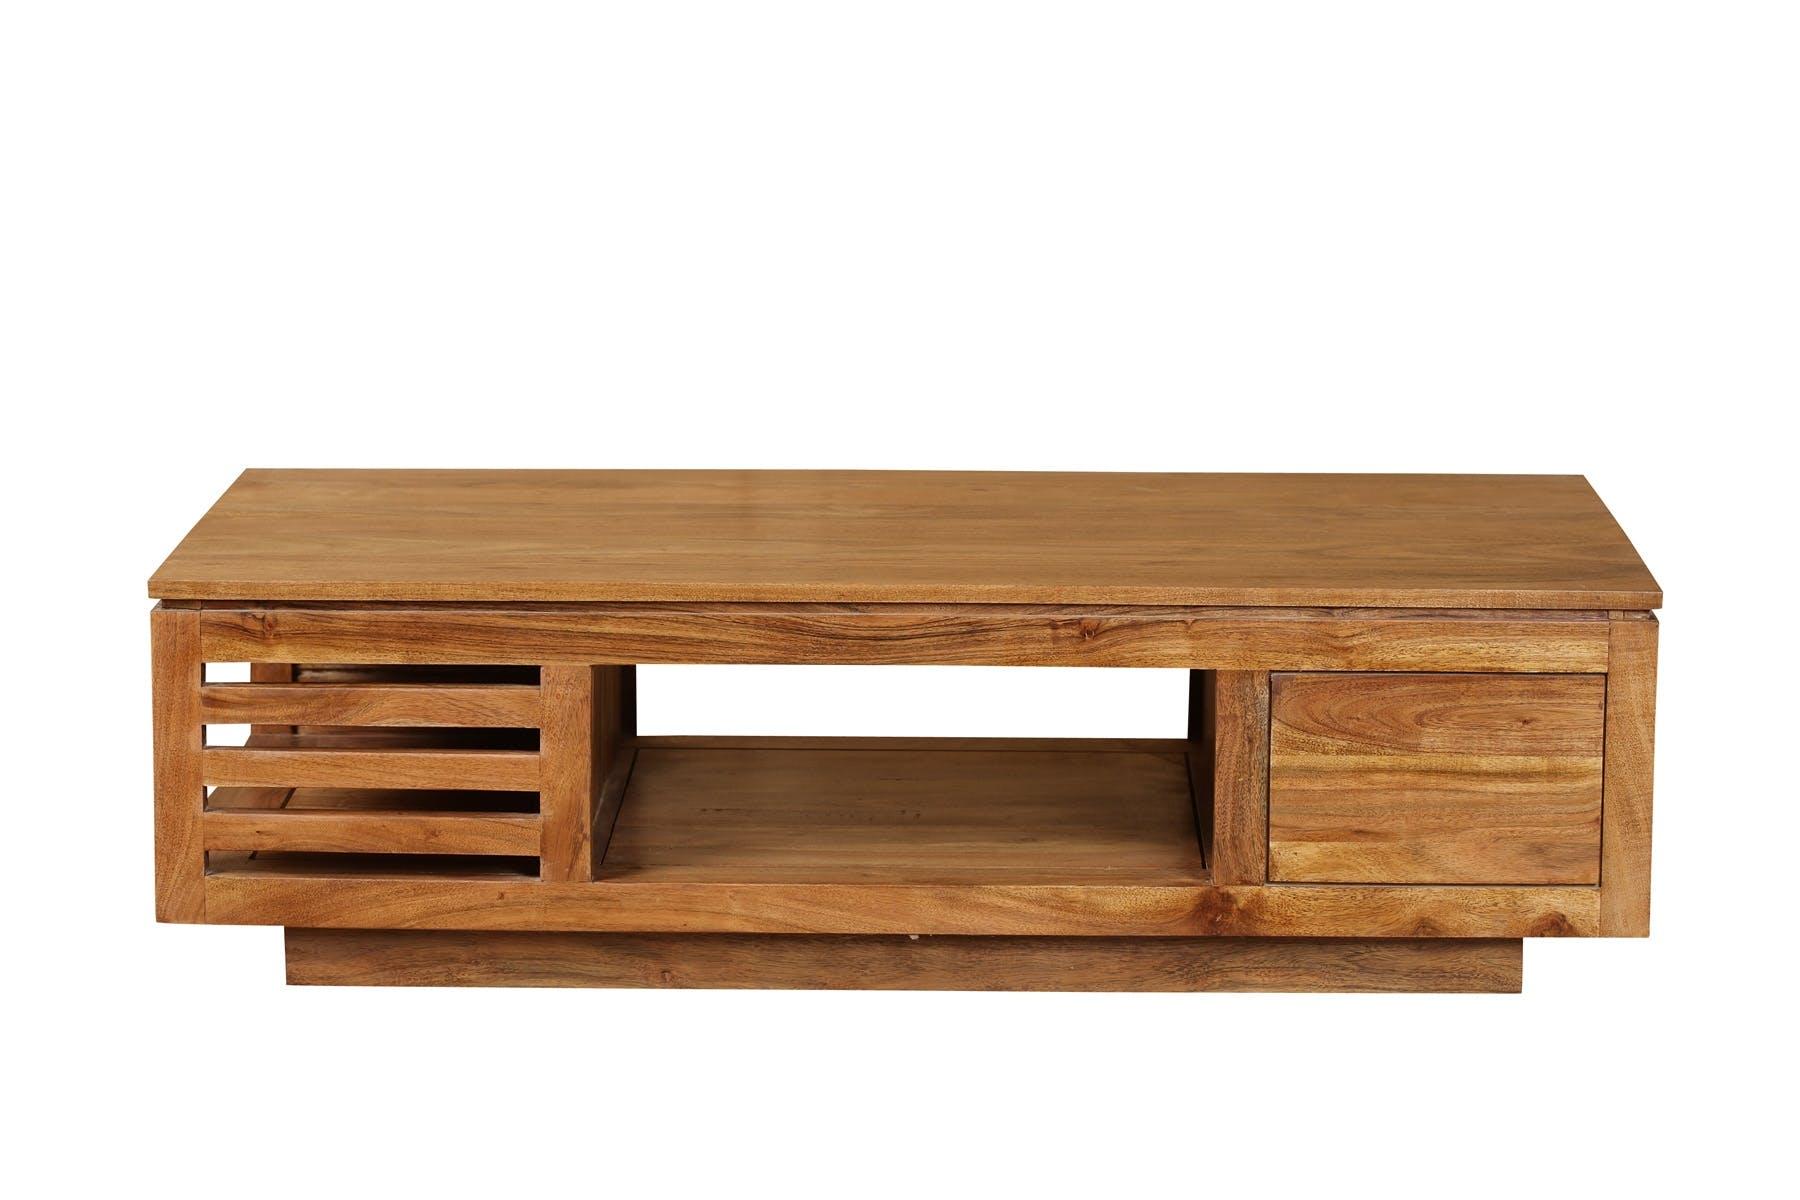 Table basse 3 niches Acacia massif miel 120x60x34,5cm BOREAL MIEL